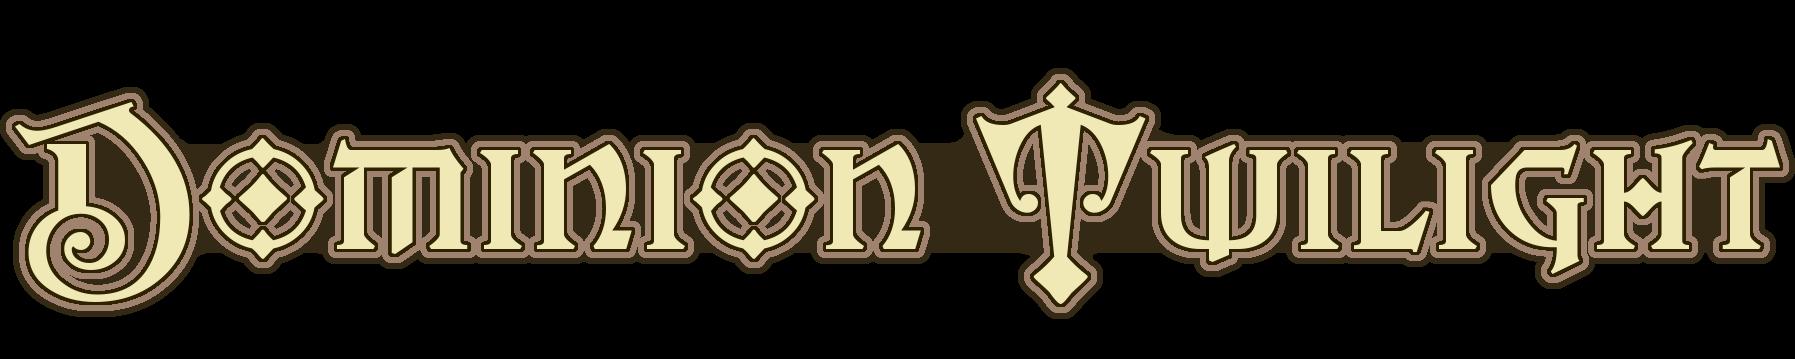 Dominiontwilightbanner5